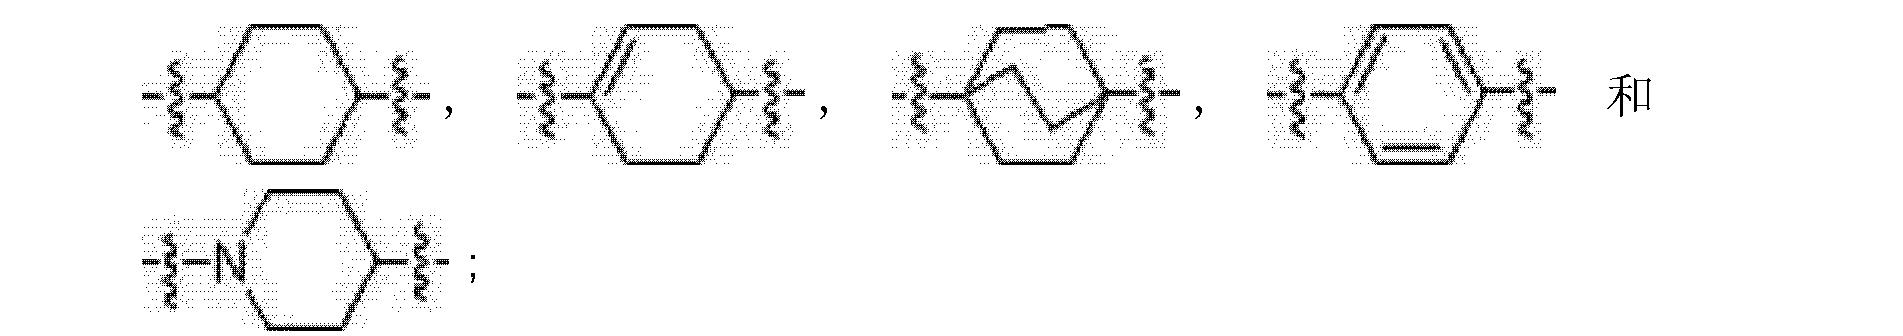 Figure CN102378762AD00281